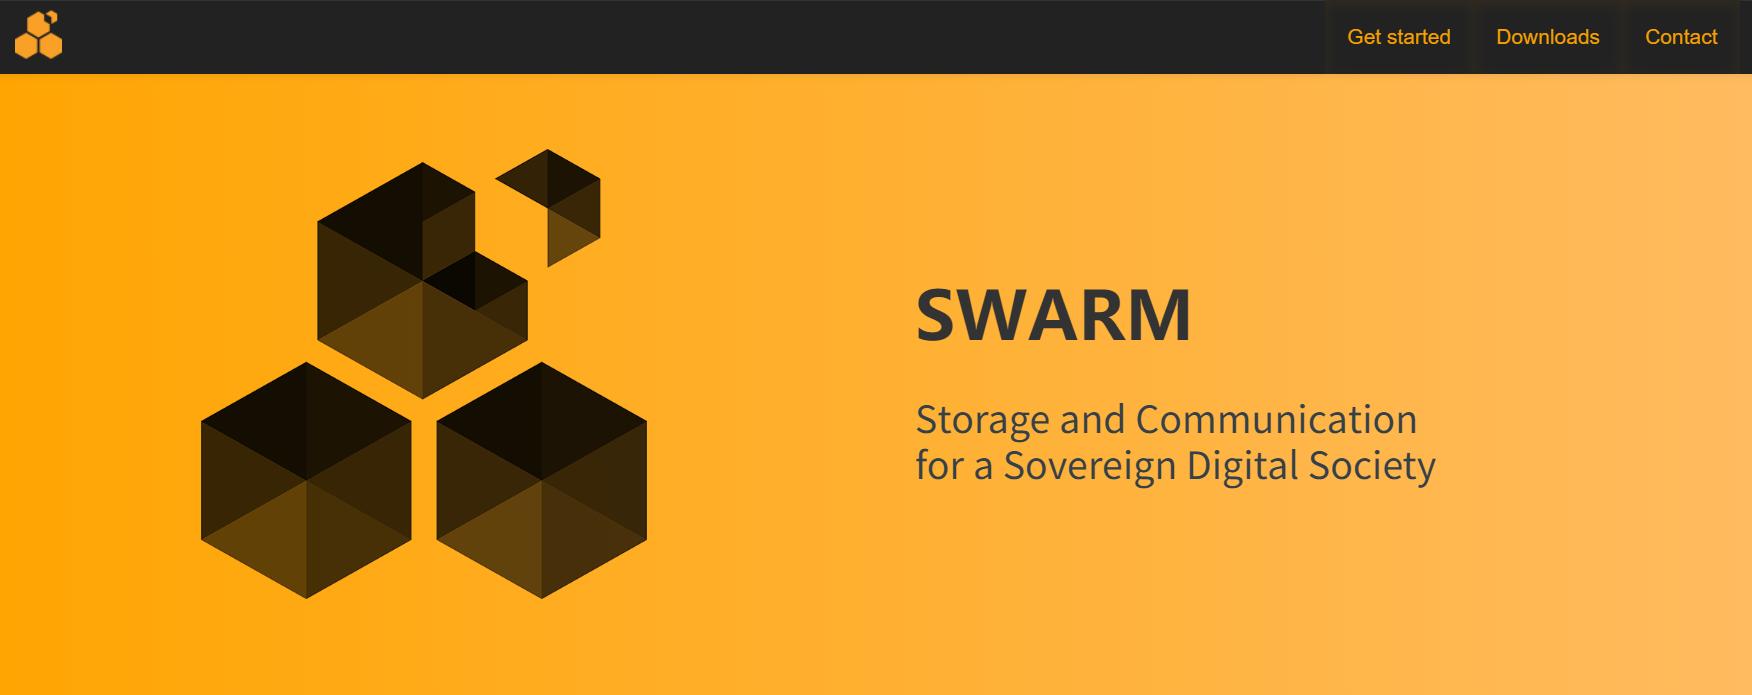 Swarm以太坊存储基础设施